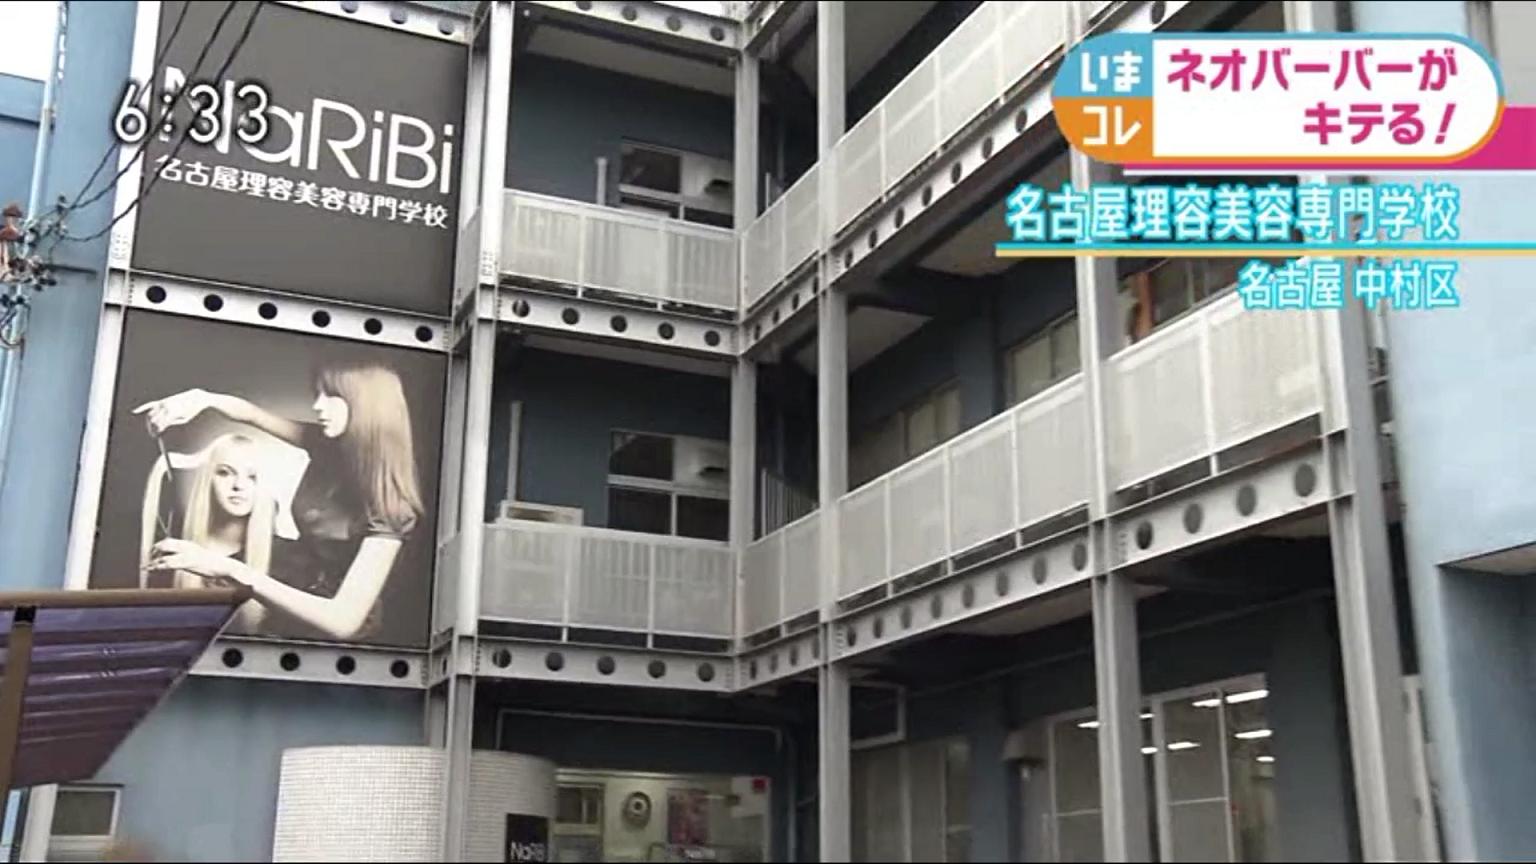 NaRiBiの理容科がNHKの取材を受けました!!